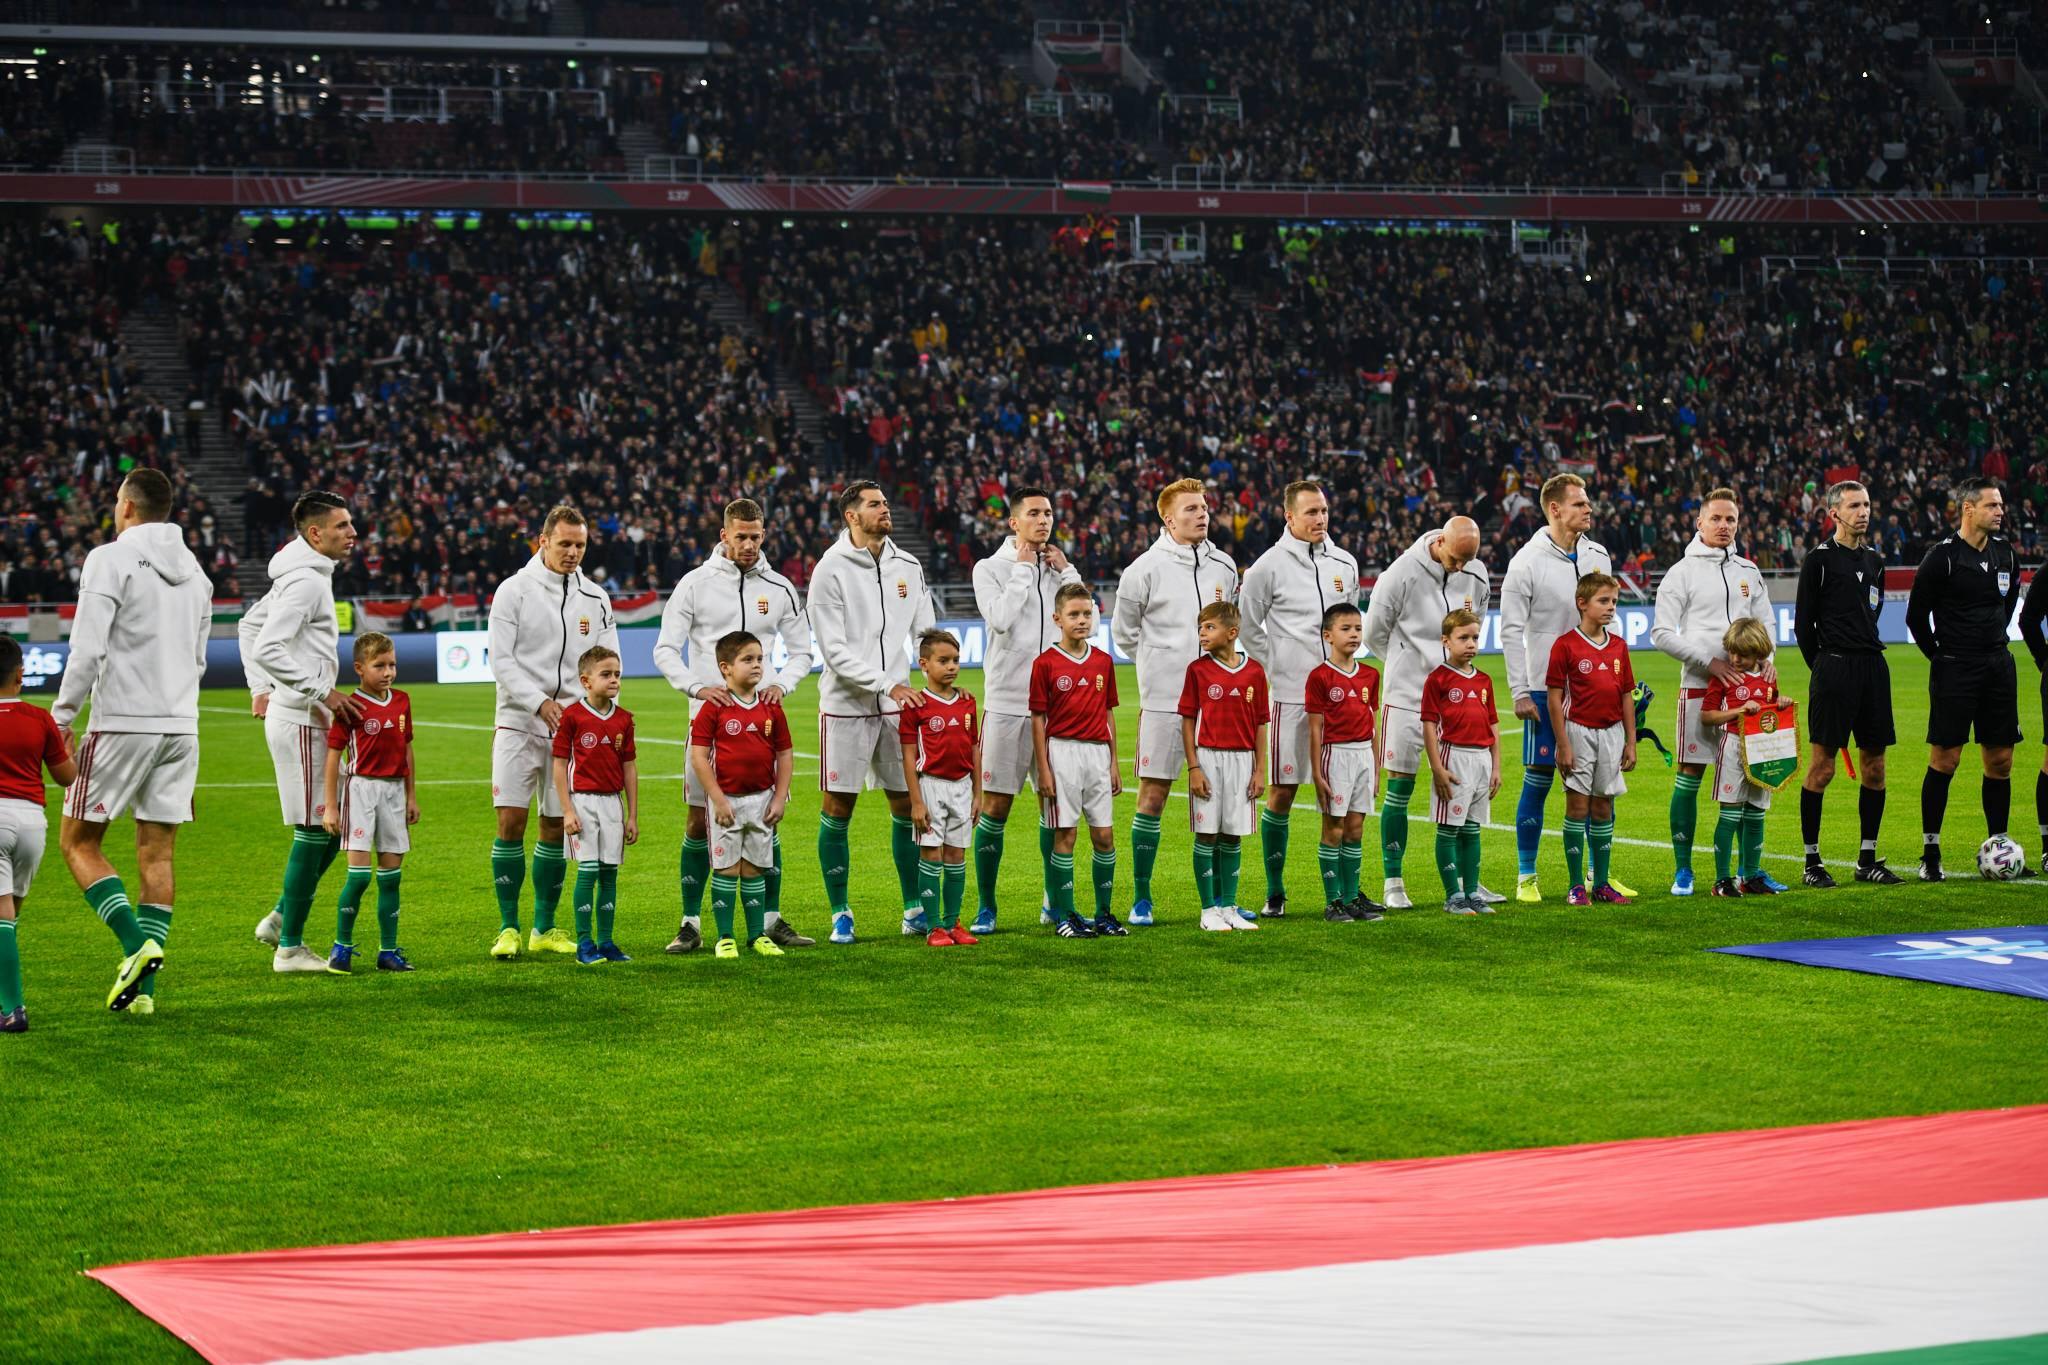 puskás football Hungarian team